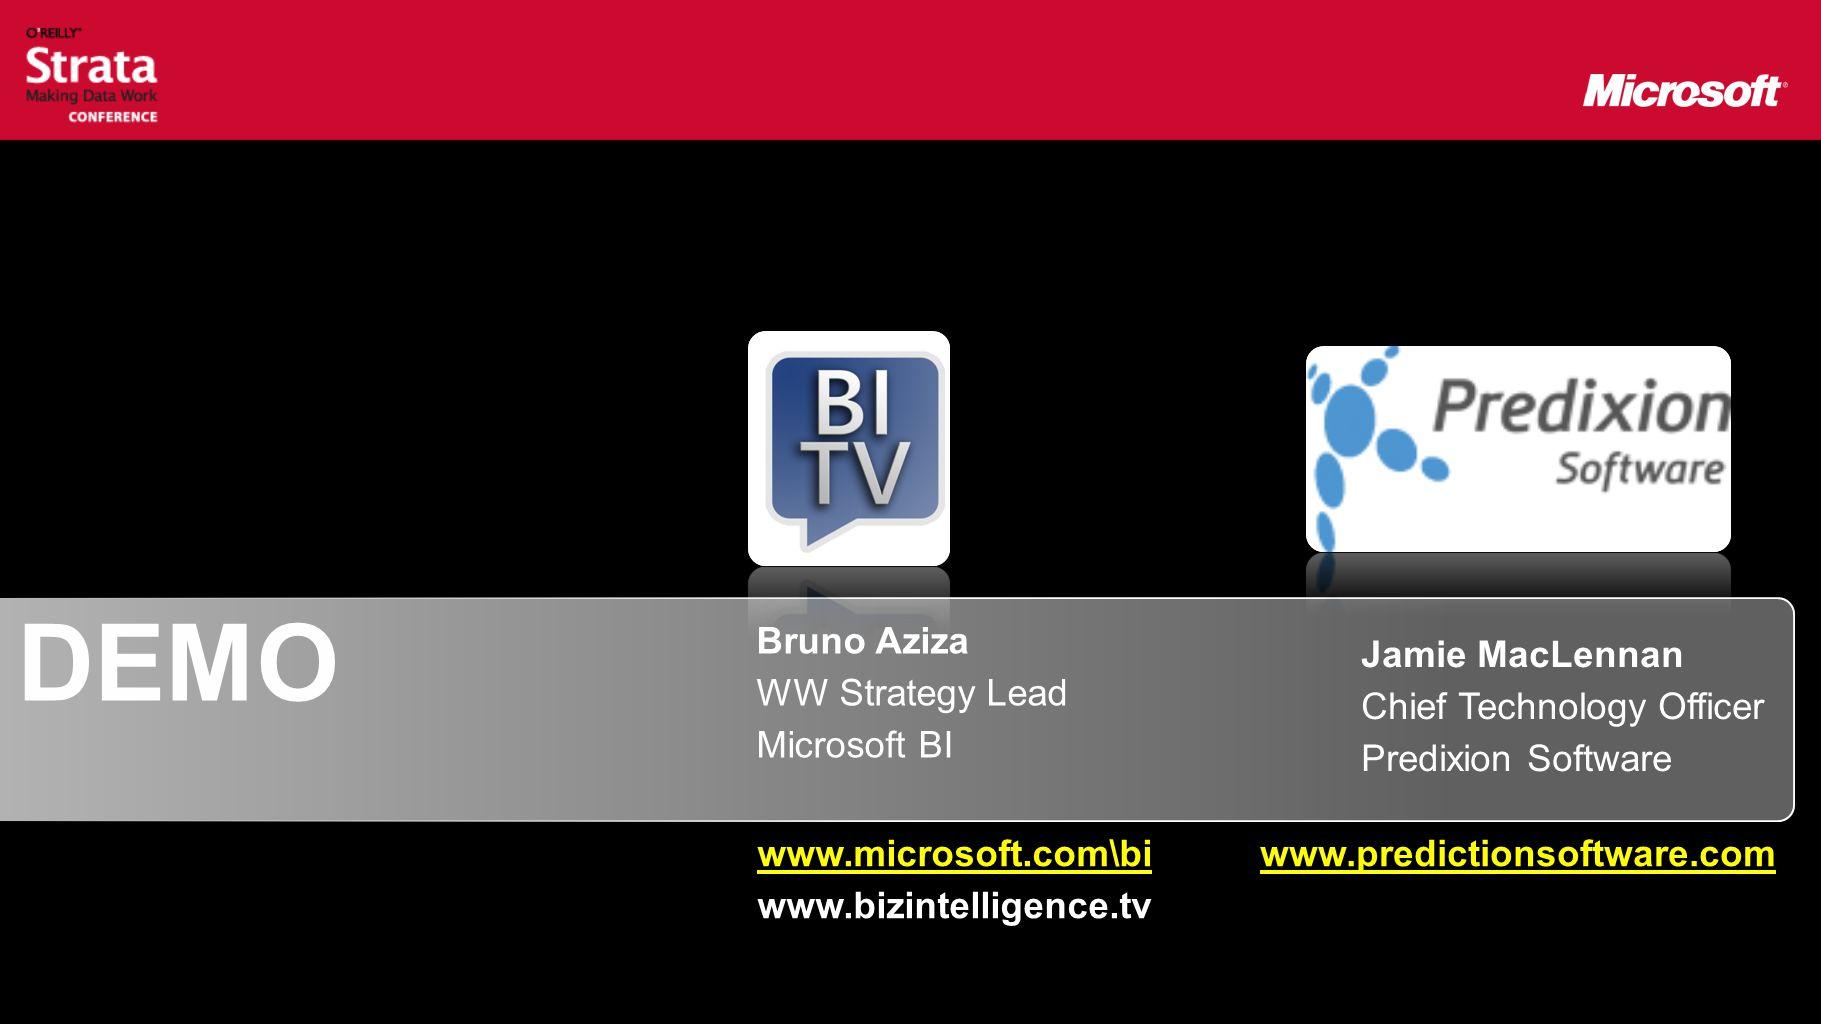 DEMO Jamie MacLennan Chief Technology Officer Predixion Software Bruno Aziza WW Strategy Lead Microsoft BI www.microsoft.com\bi www.bizintelligence.tv www.predictionsoftware.com